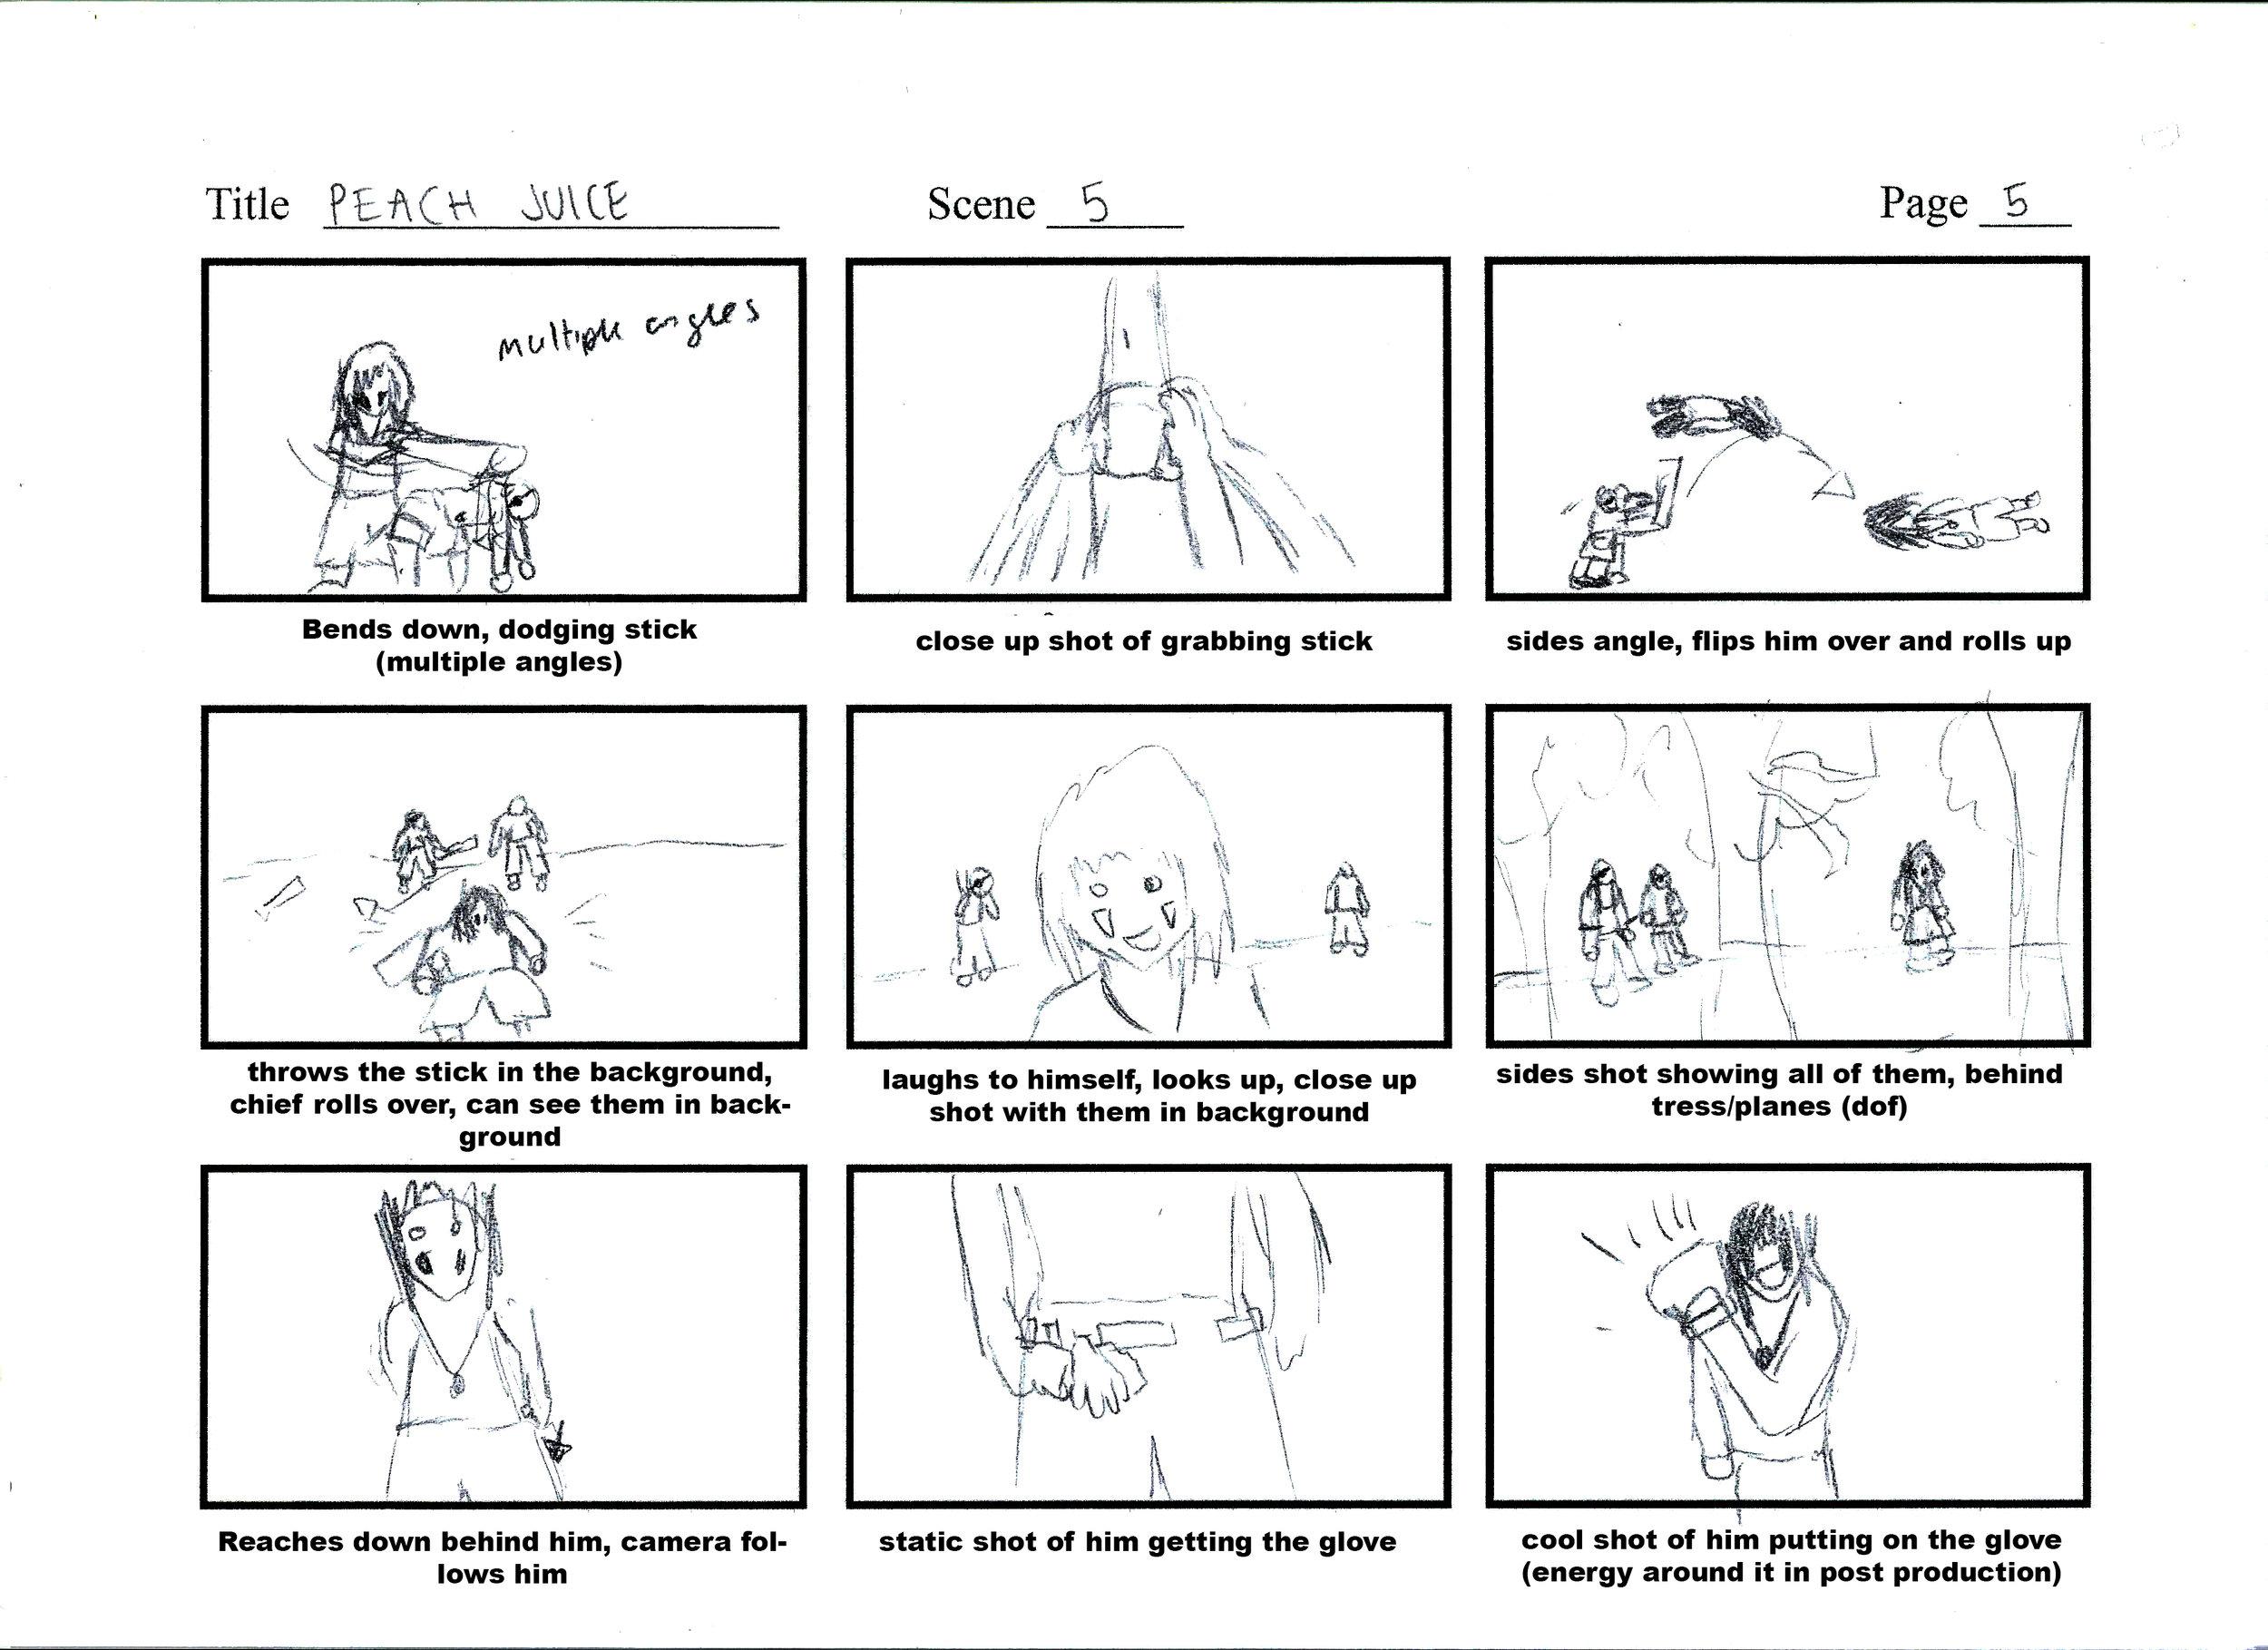 peace juice storyboard 5.jpg